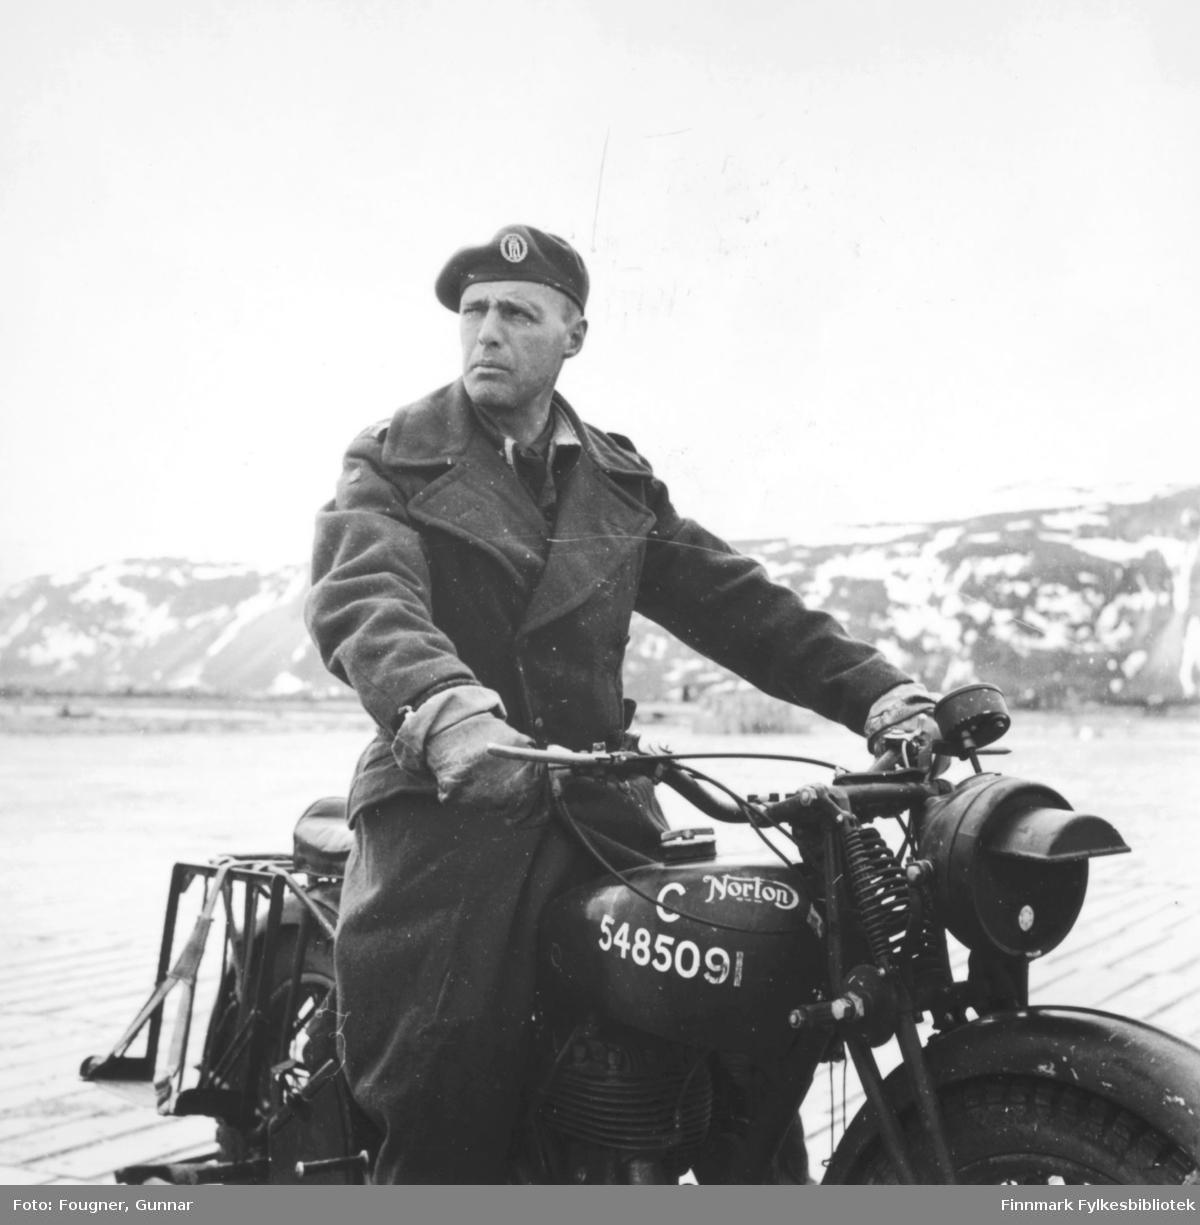 På Banak flyplass. En offiser på en 'Norton' motorsykkel.